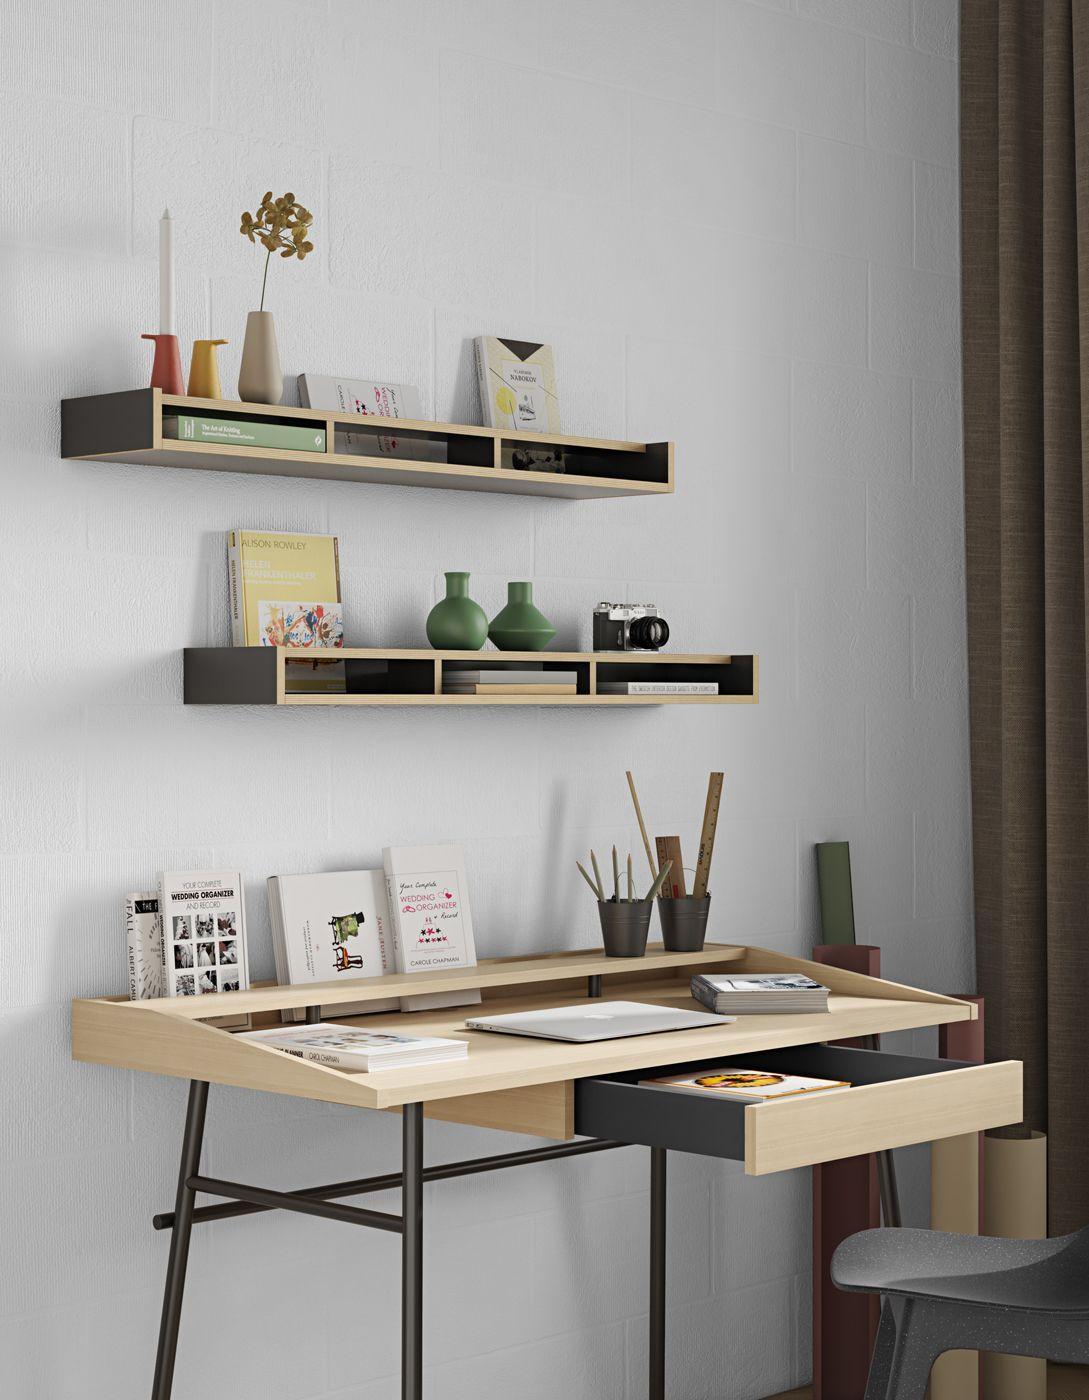 Temahome Ply Skrivebord 120x60 - Lys egefinér/Sort